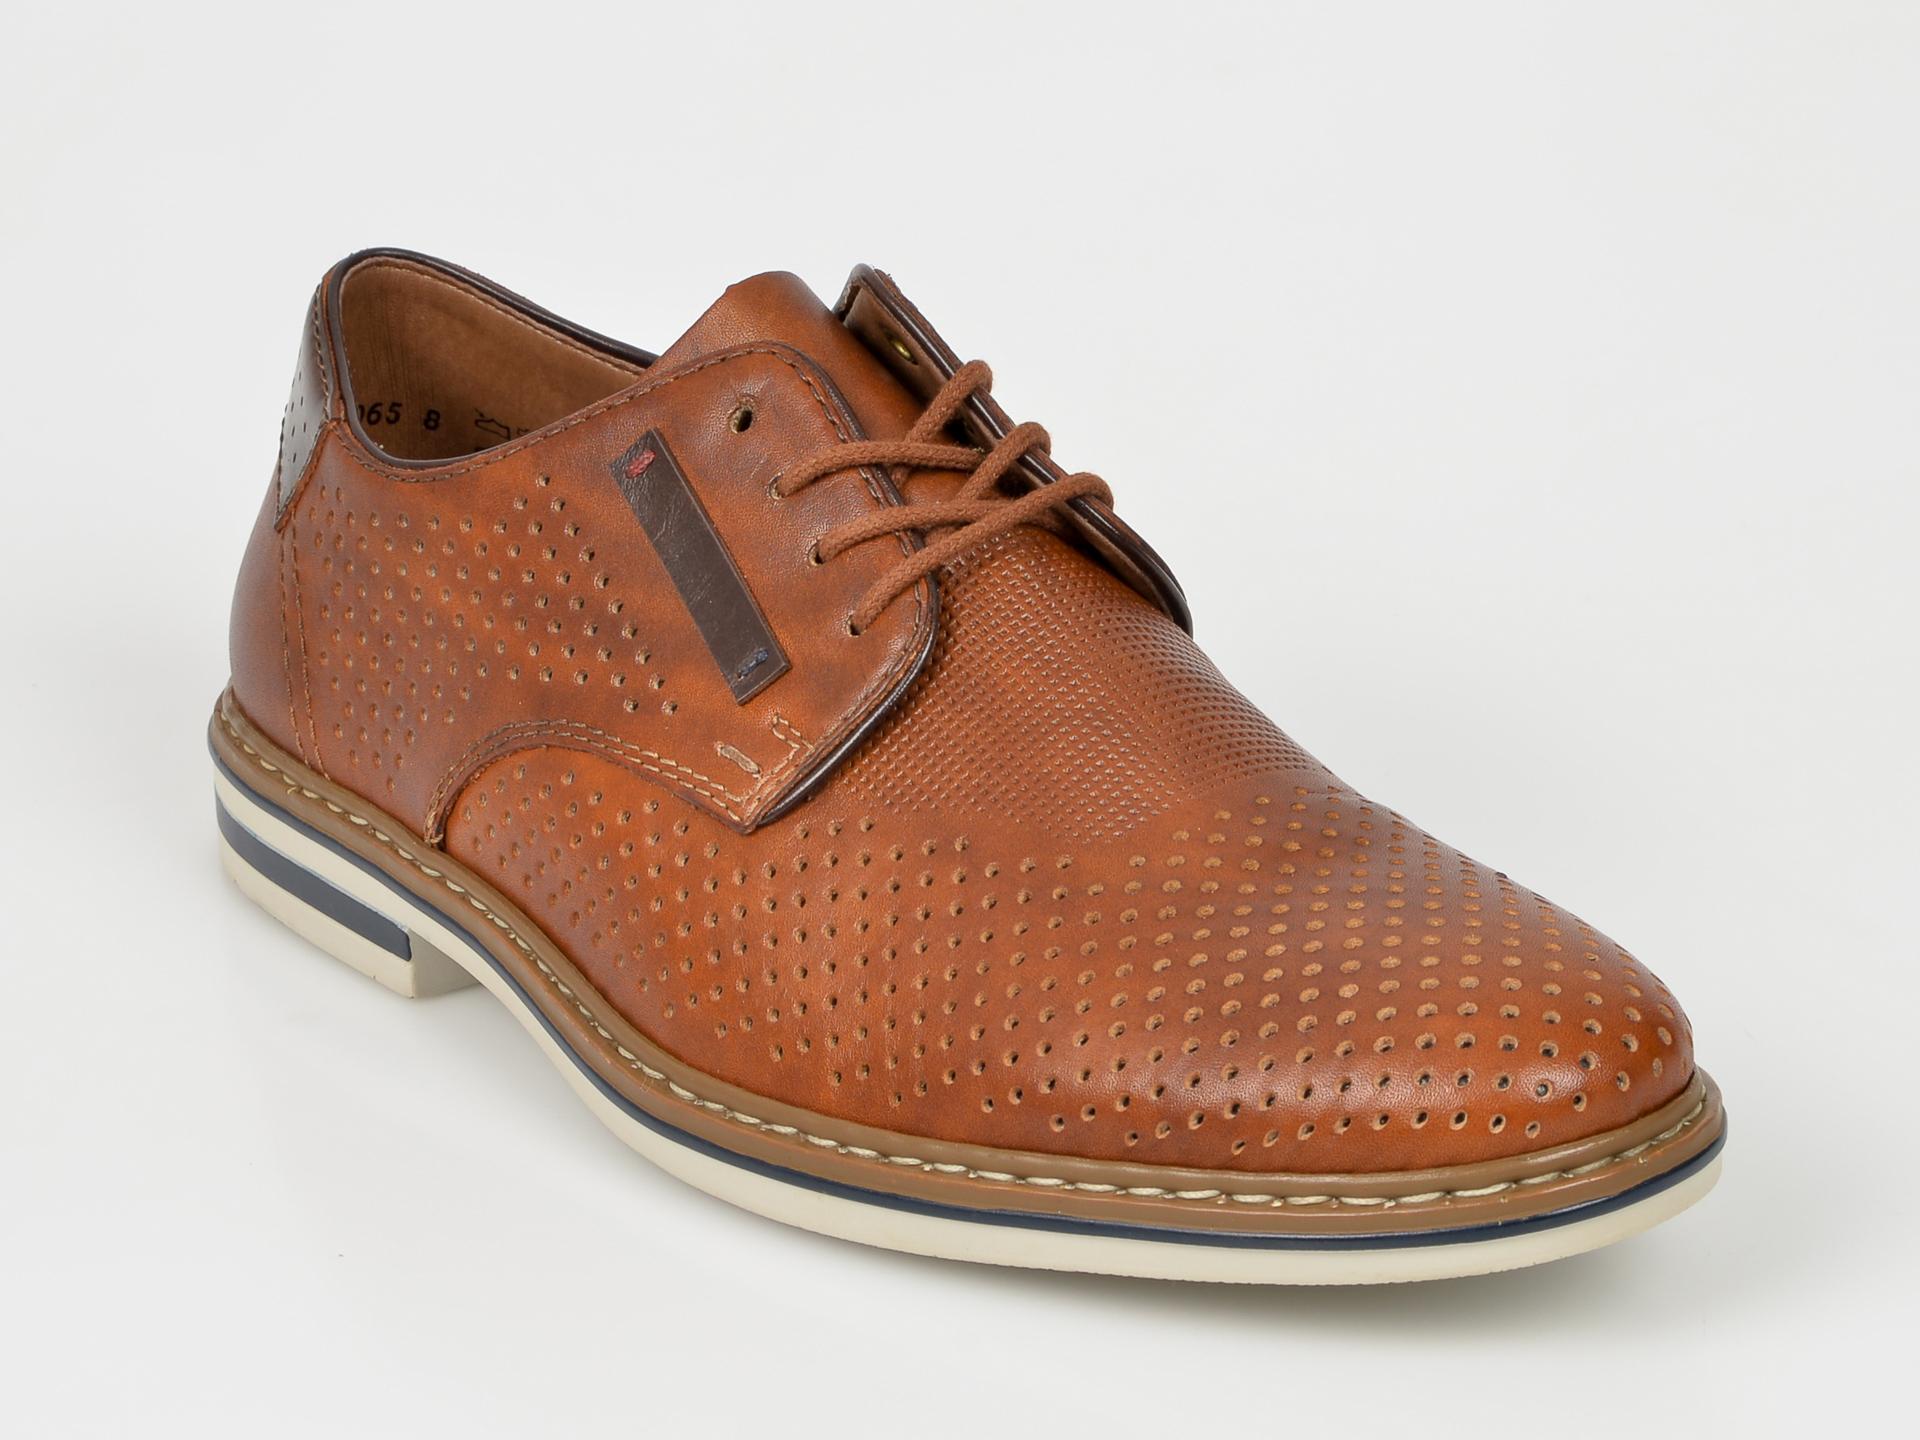 Pantofi Rieker Maro, B14c5, Din Piele Naturala